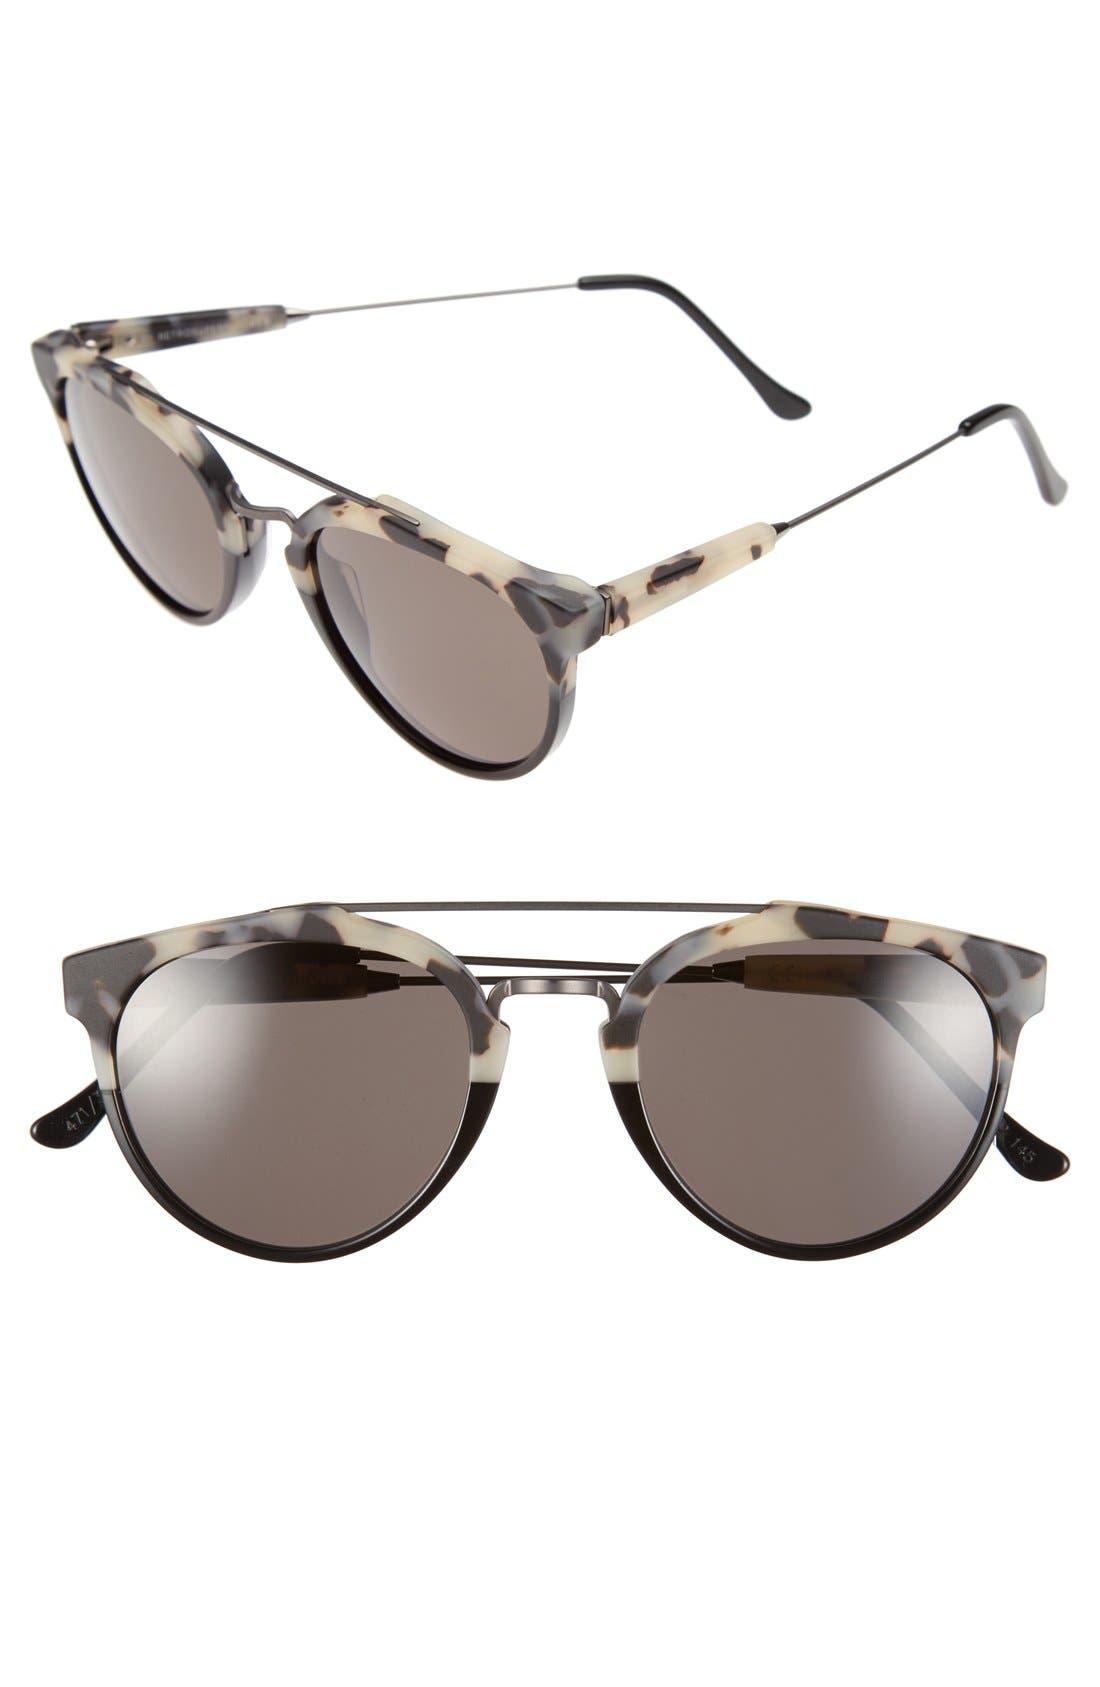 Main Image - SUPER by RETROSUPERFUTURE® 'Giaguaro' 50mm Sunglasses